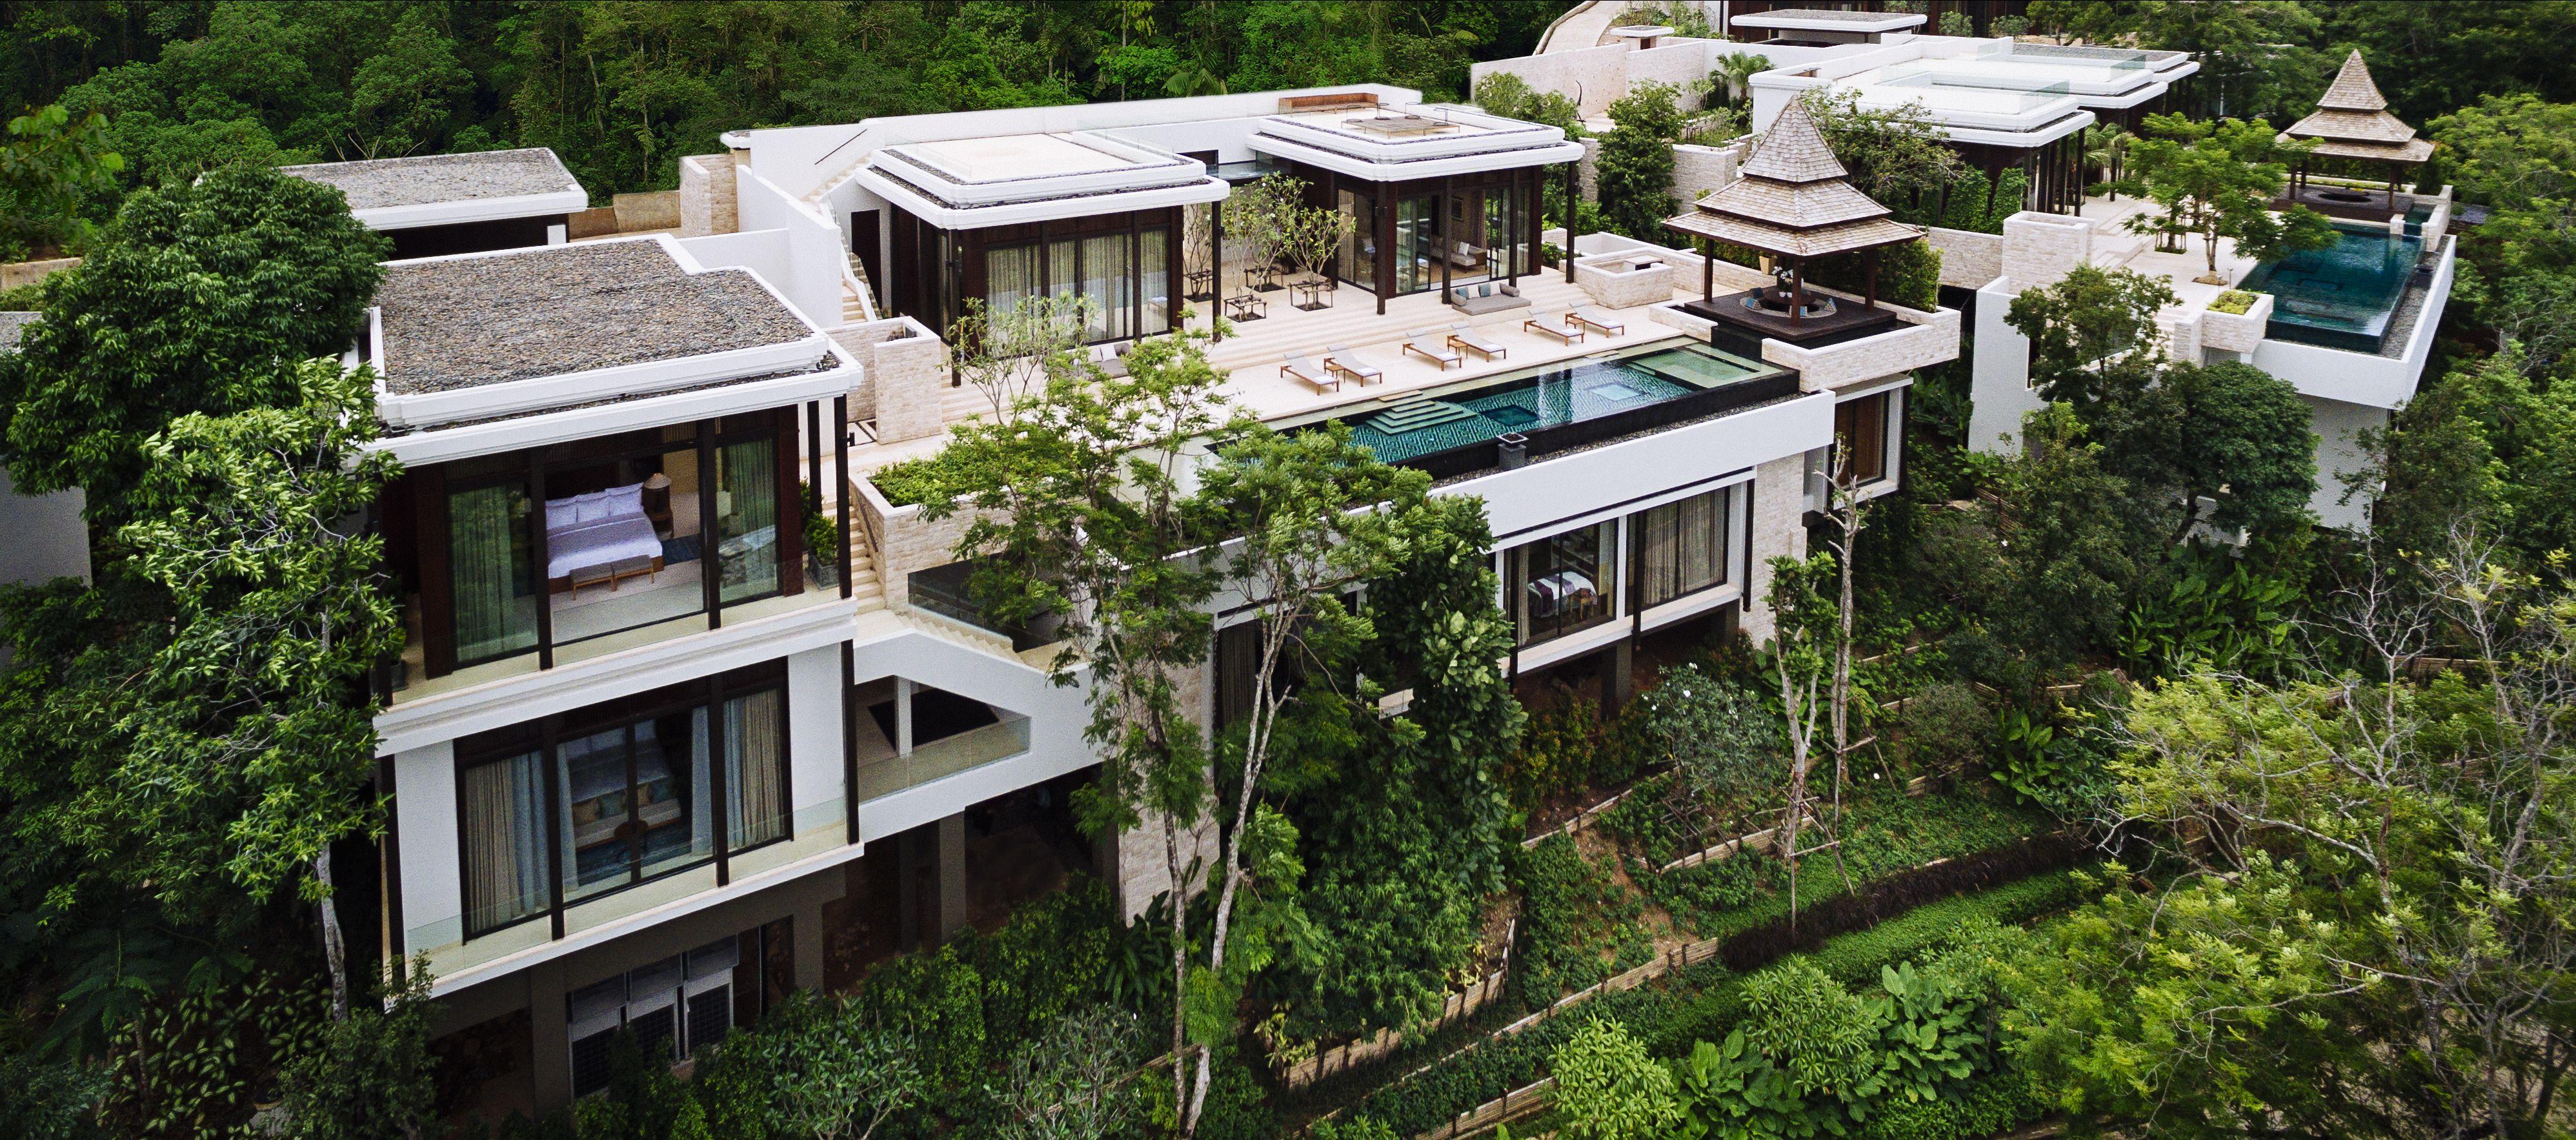 #Exoticthailand #Luxurythailand #Exotictraveling #Exoticexperience